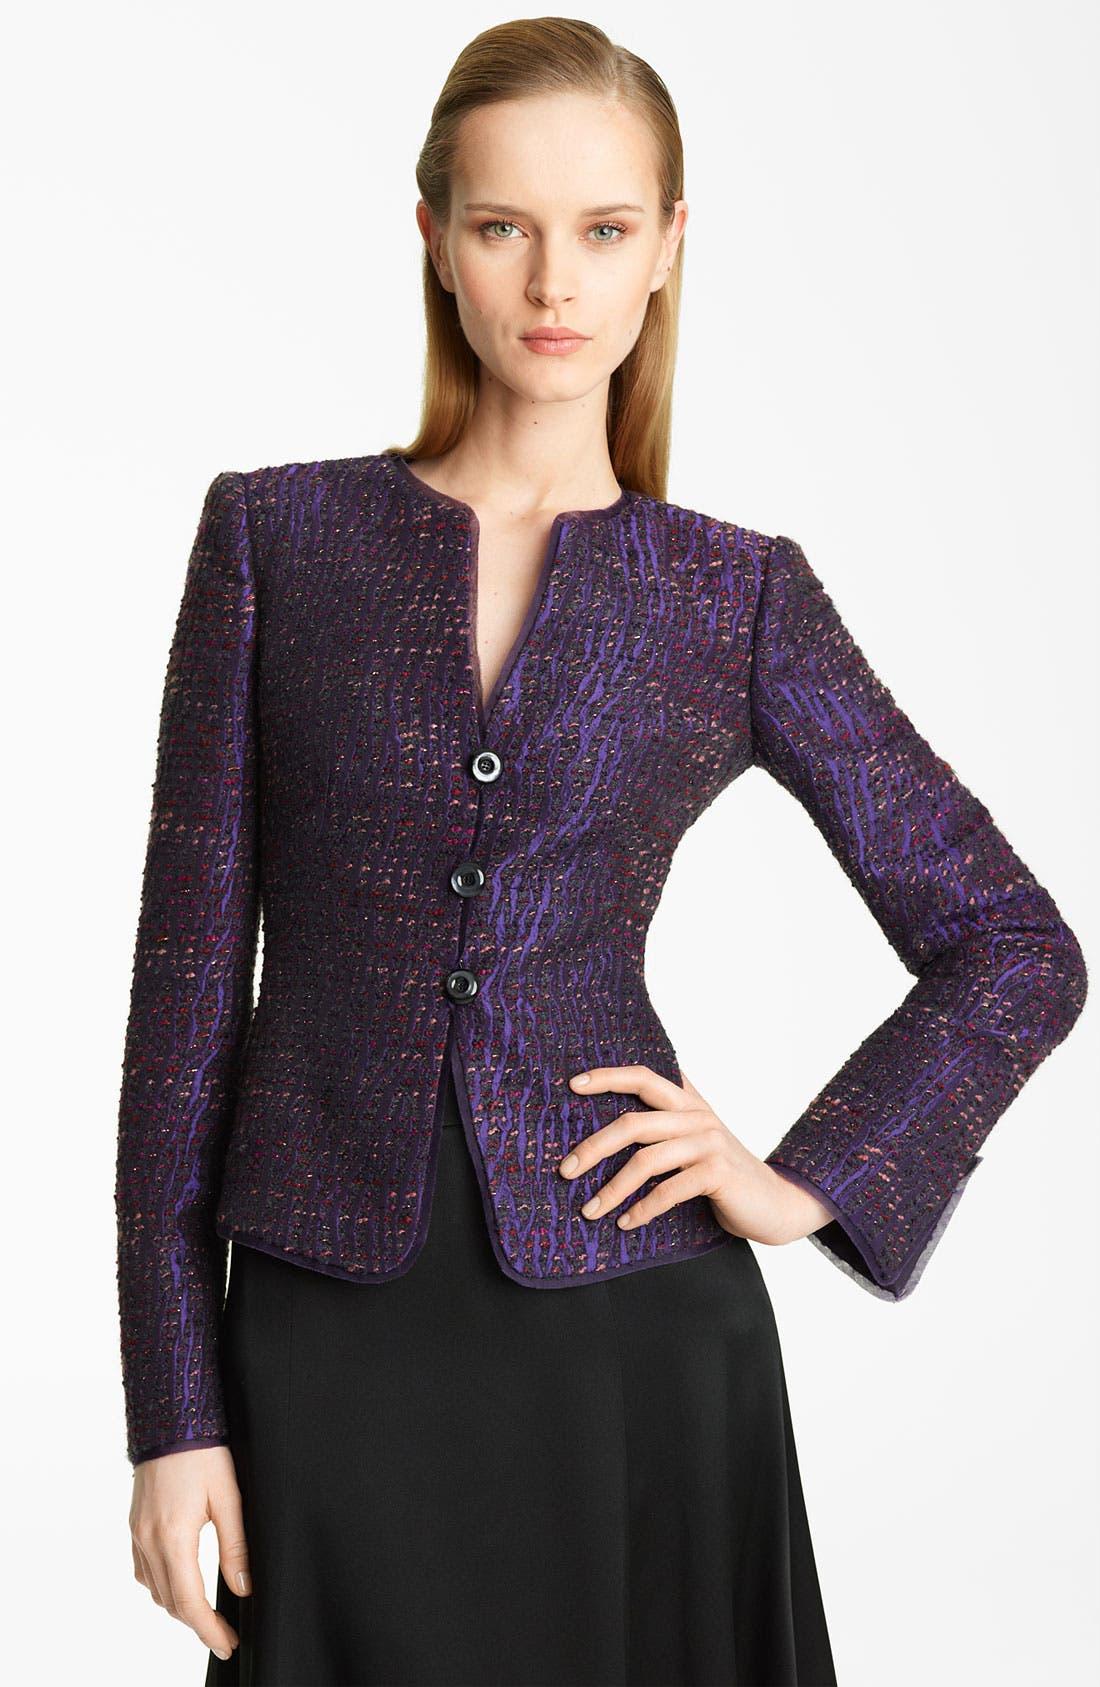 Main Image - Armani Collezioni Lamé Textured Tweed Jacket